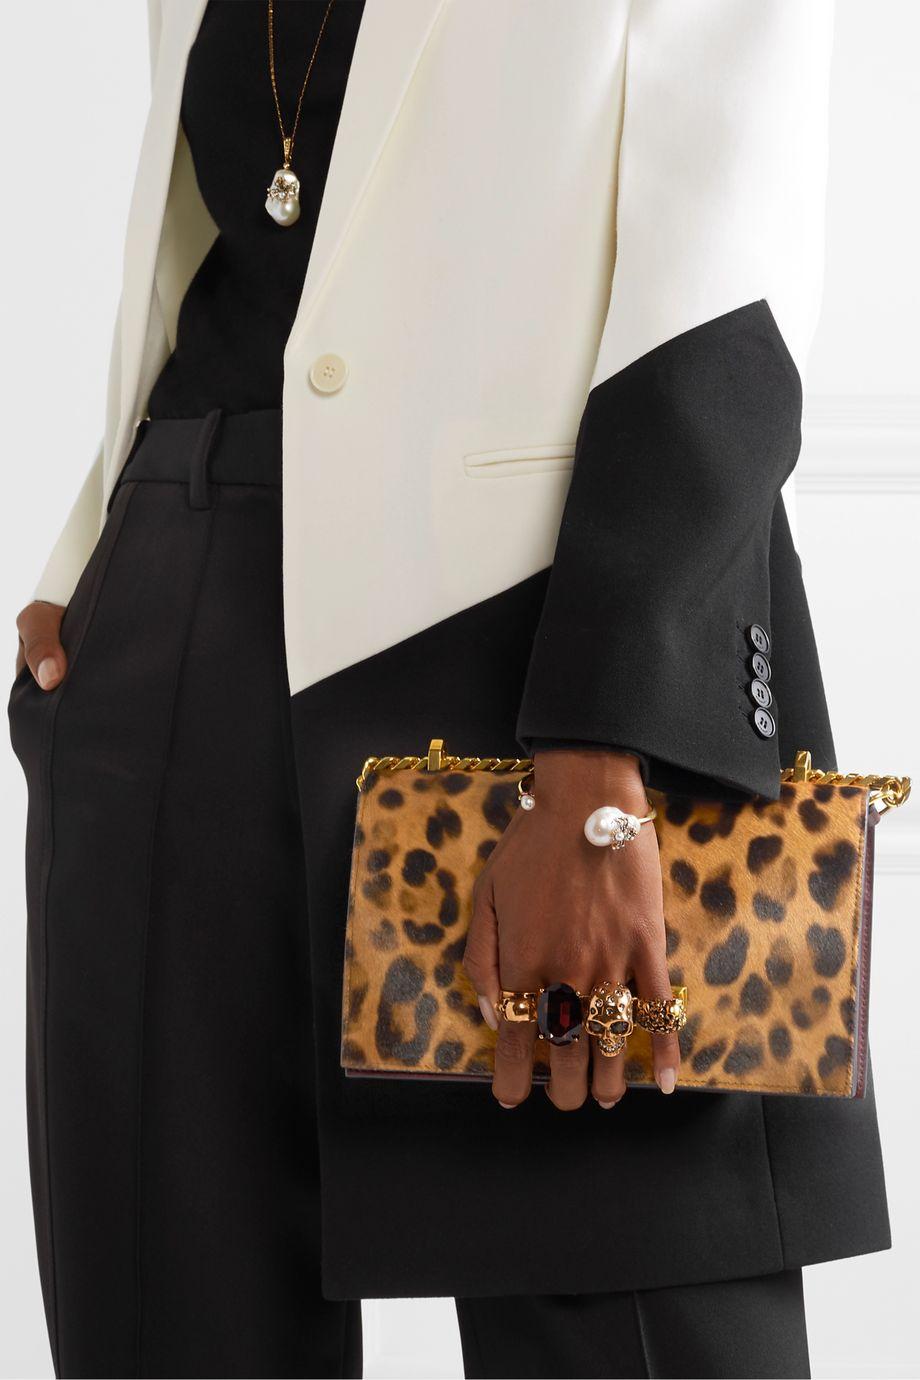 Alexander McQueen Jewelled Satchel embellished leather and leopard-print calf-hair shoulder bag